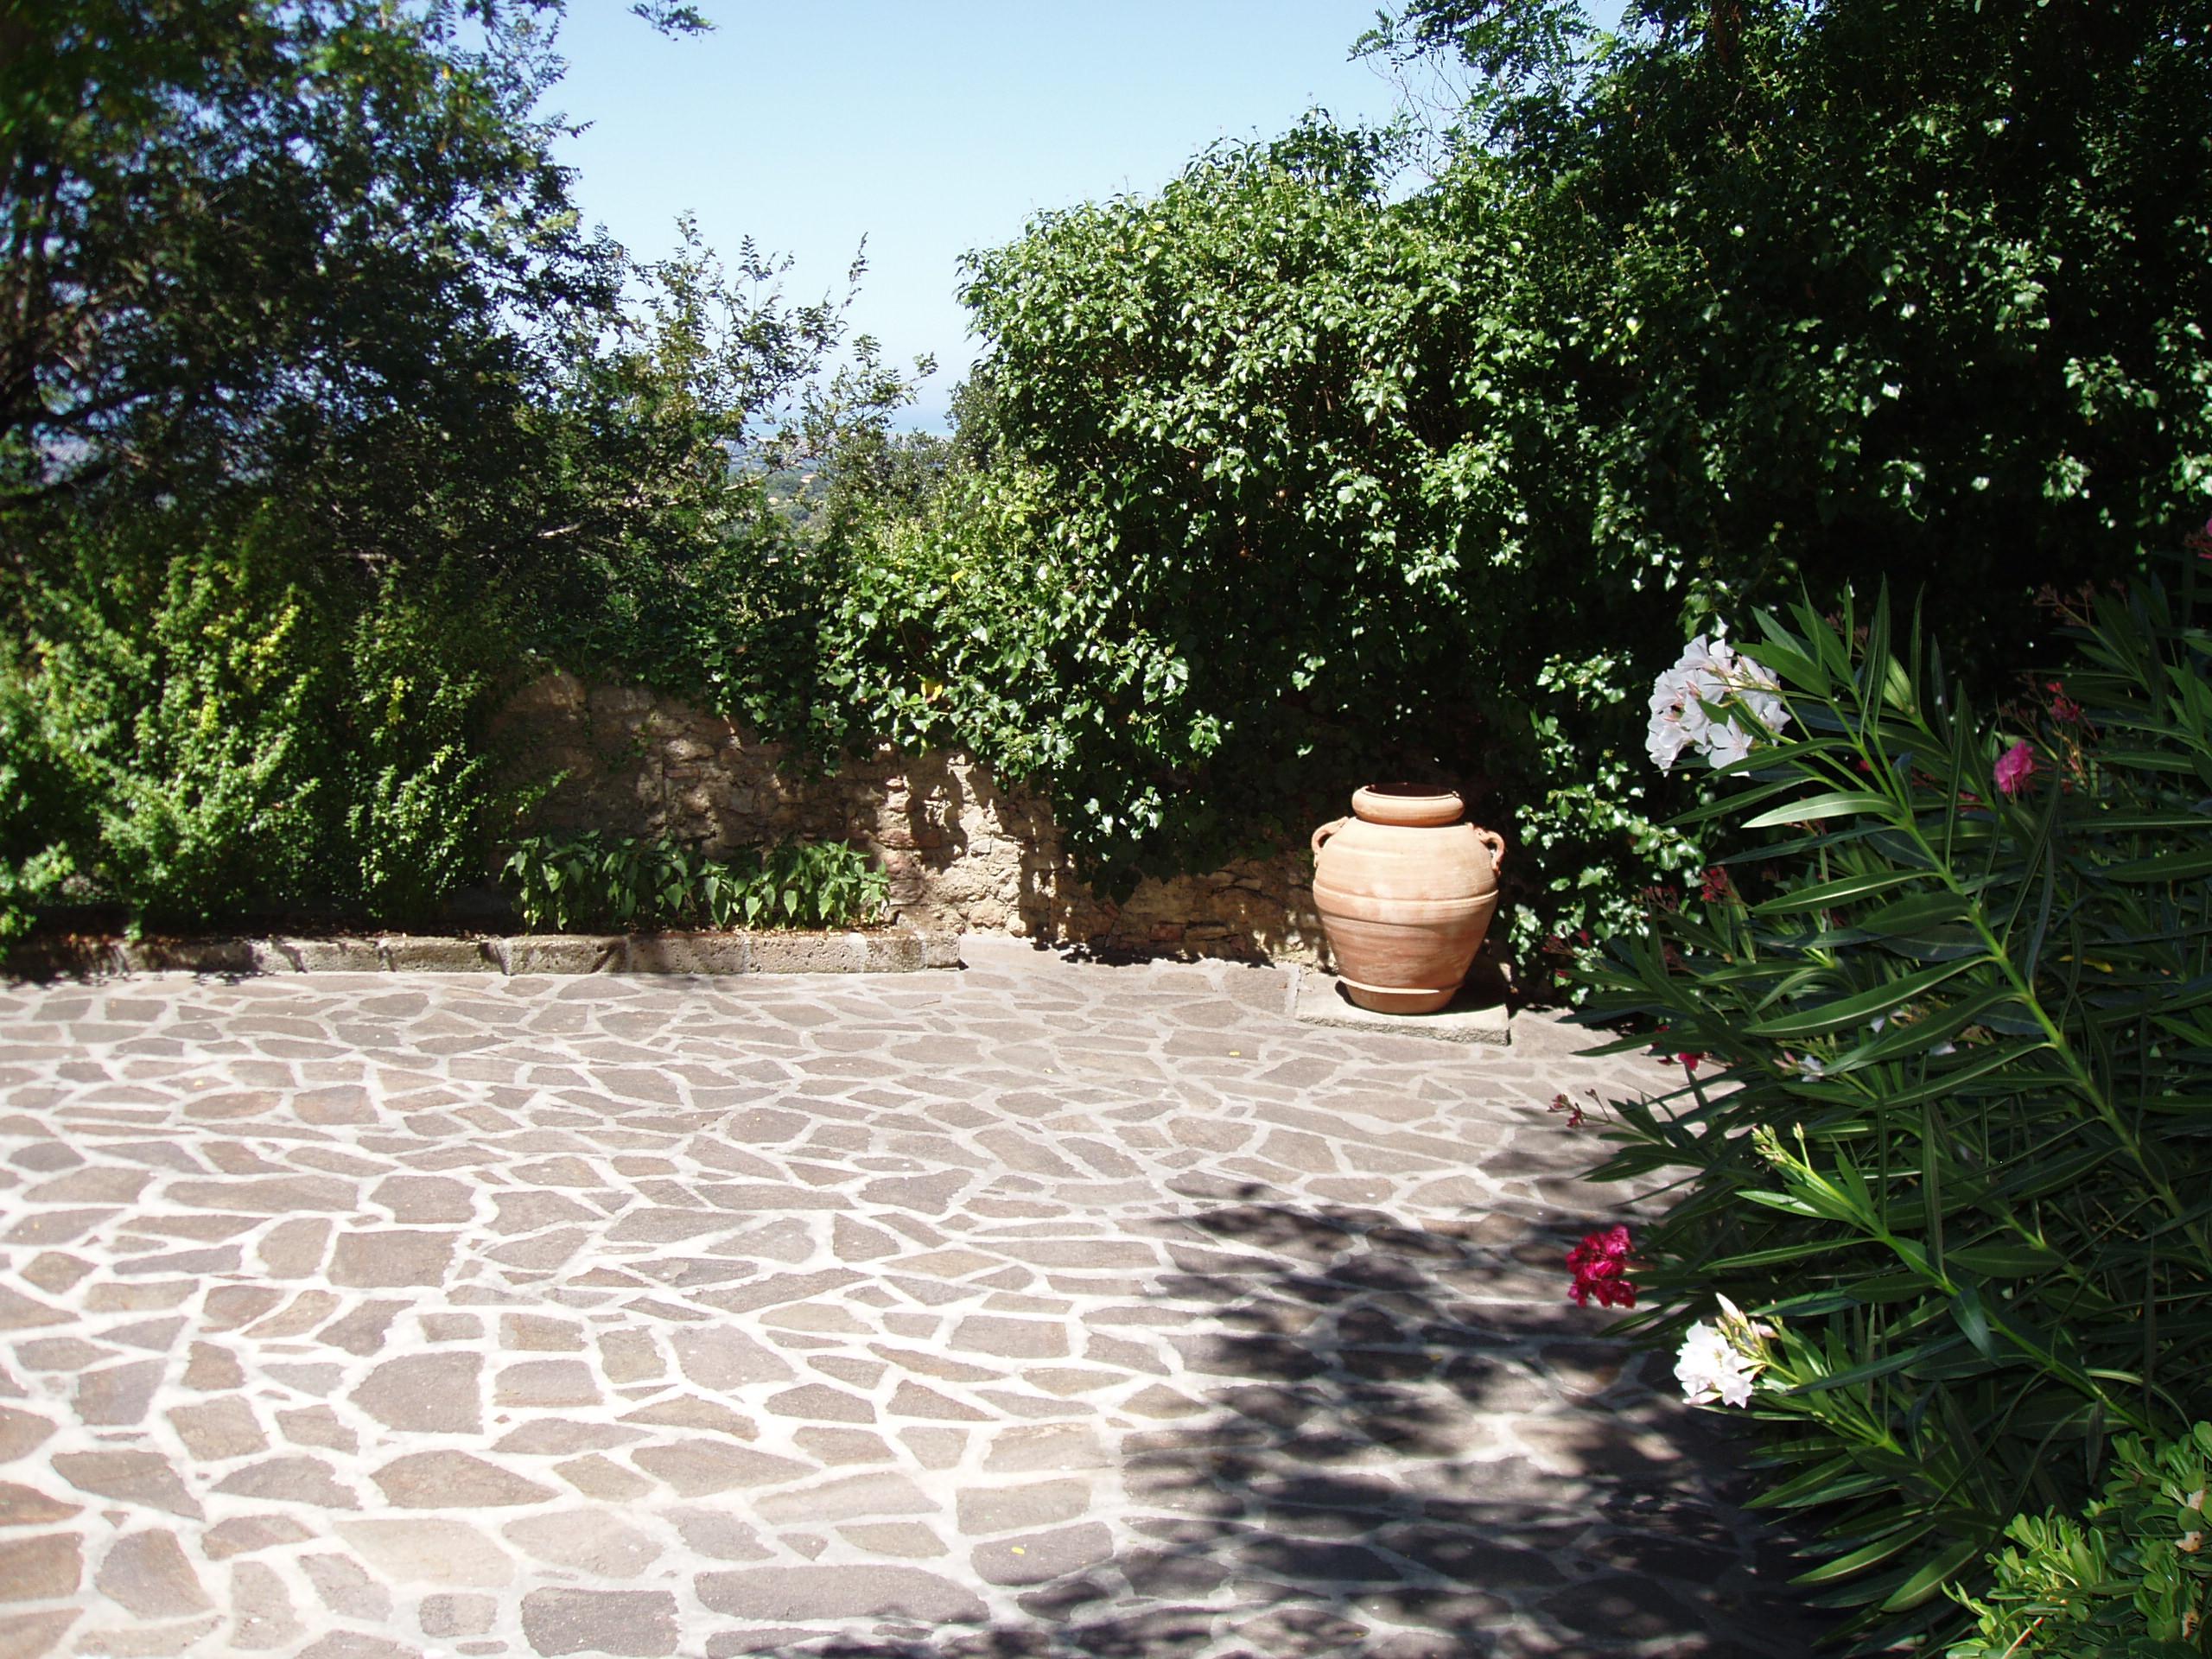 Indorf - Ferienhaus in Casale Marittimo (Toskana) - Details